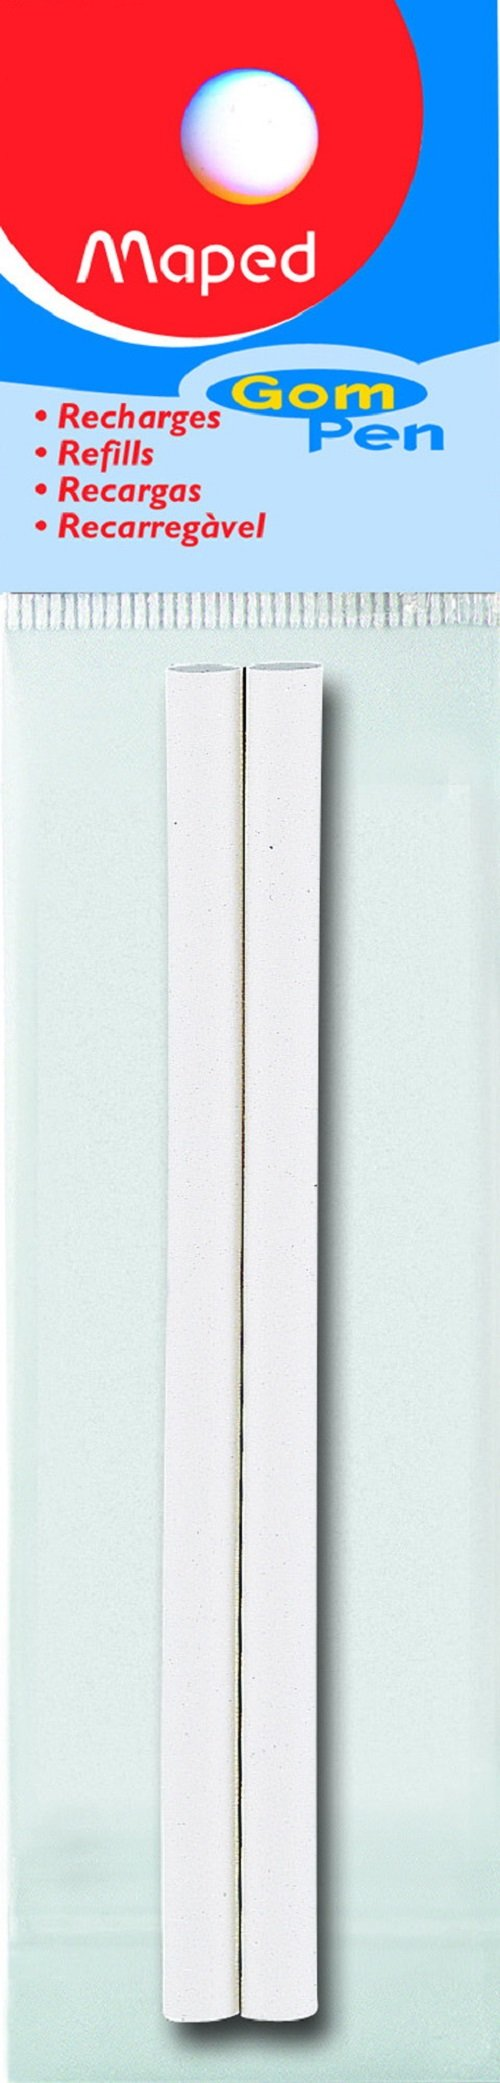 MAPED Penghapus Refill Circular Gom Pen Hanging